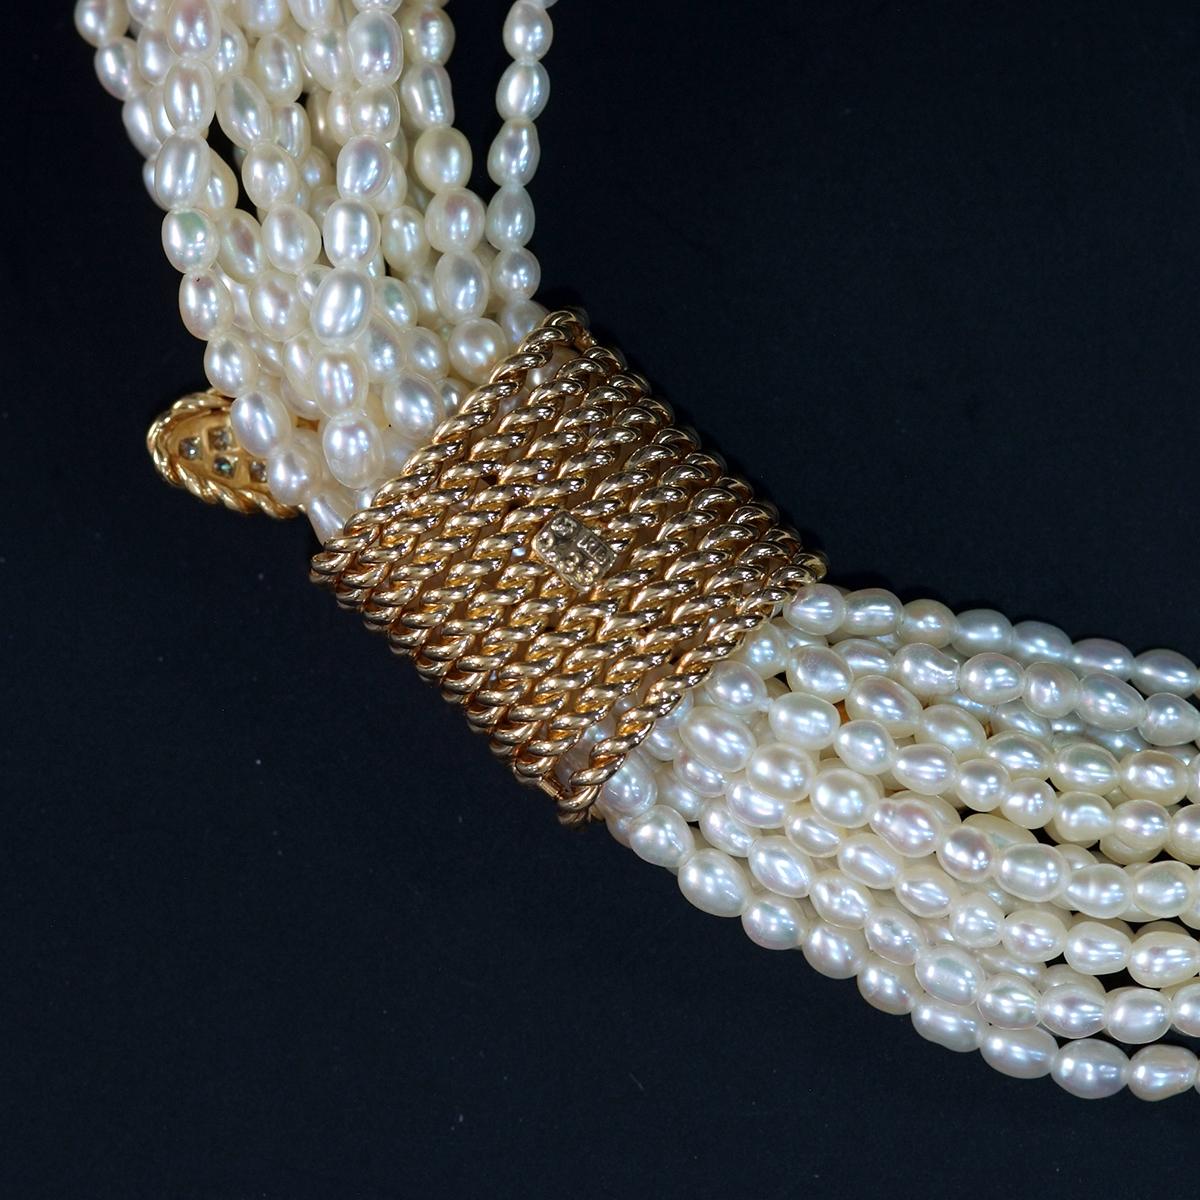 F0211【MIKIMOTO 1899】ミキモト パール 天然絶品ダイヤモンド0.33ct 最高級18金/14金無垢ネックレス 長さ42cm 重量87.5g 縦幅18.6mm_画像3